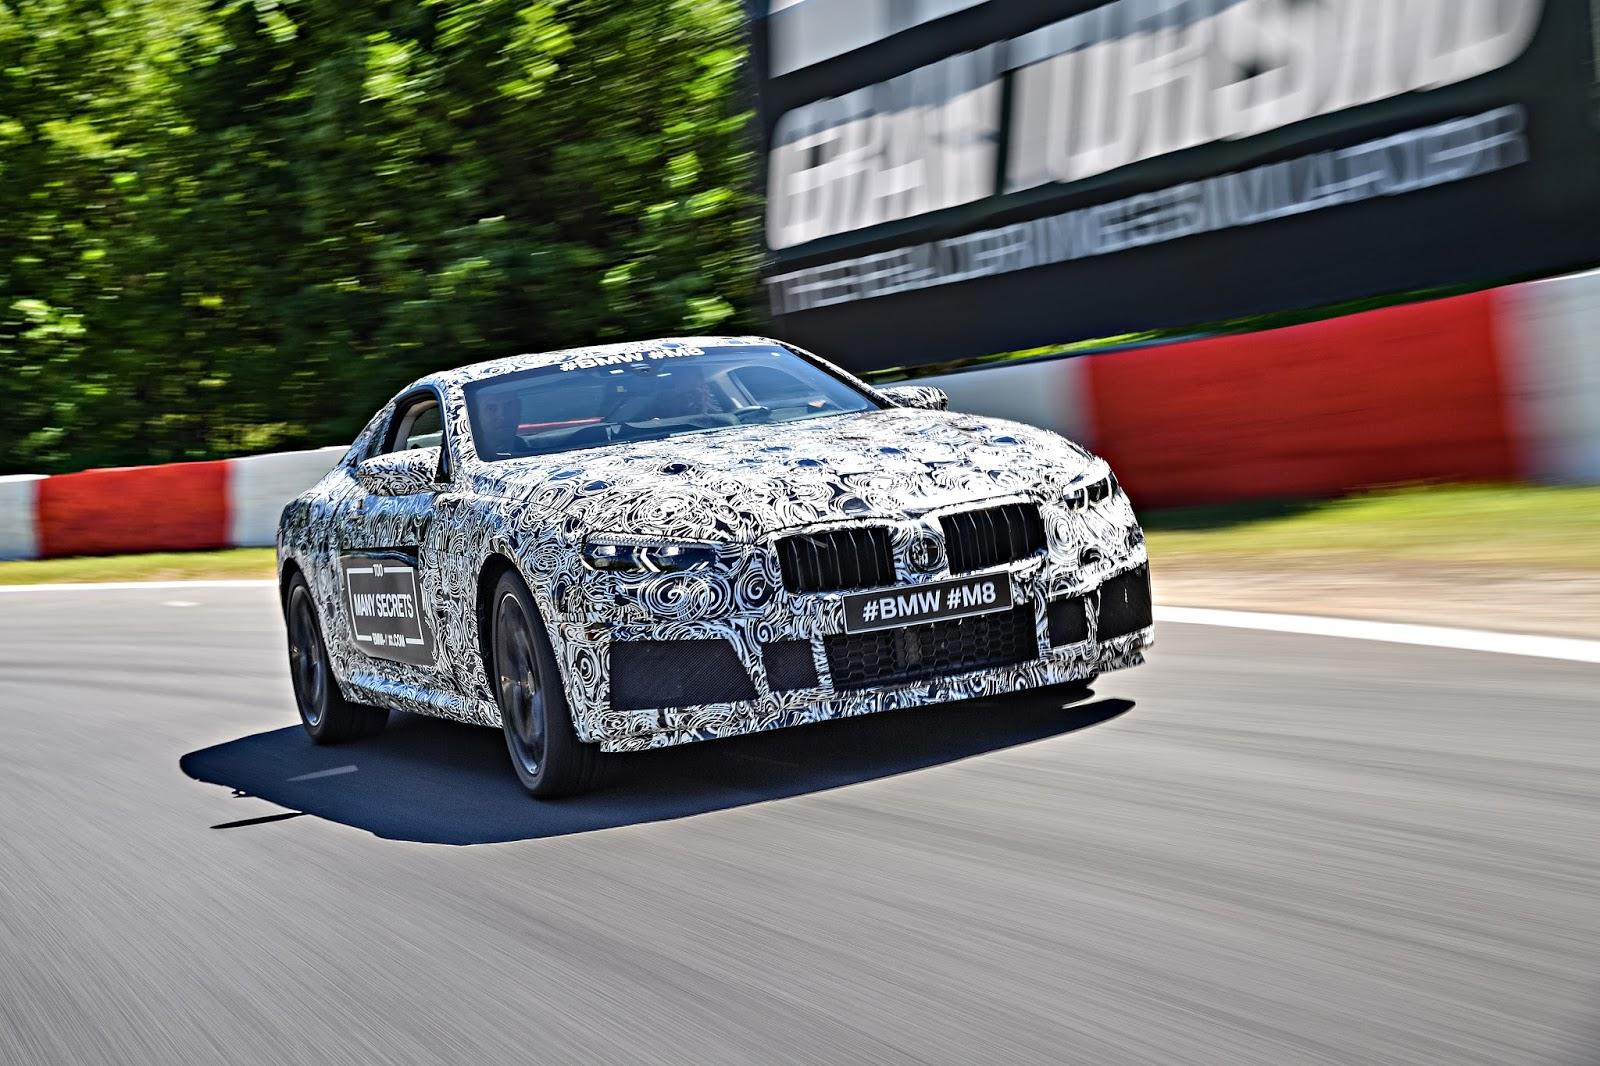 P90261523 highRes m festival bmw m8 pr H ναυαρχίδα της BMW, η M8 θα είναι οκτακύλινδρη BMW, BMW Concept, BMW Concept 8 Series, BMW M, BMW M Performance, BMW M8